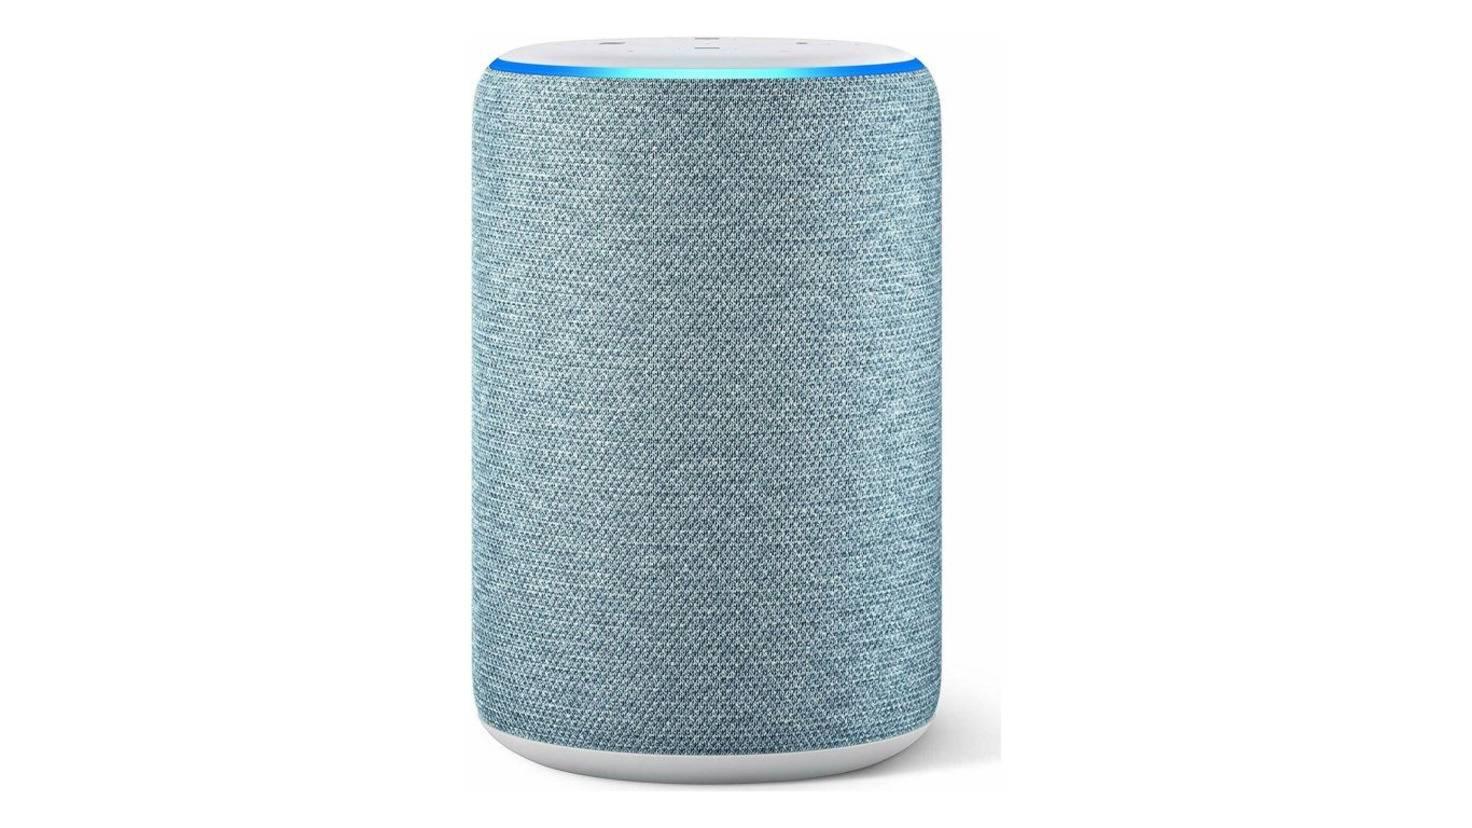 amazon-echo-3-generation-smart-speaker